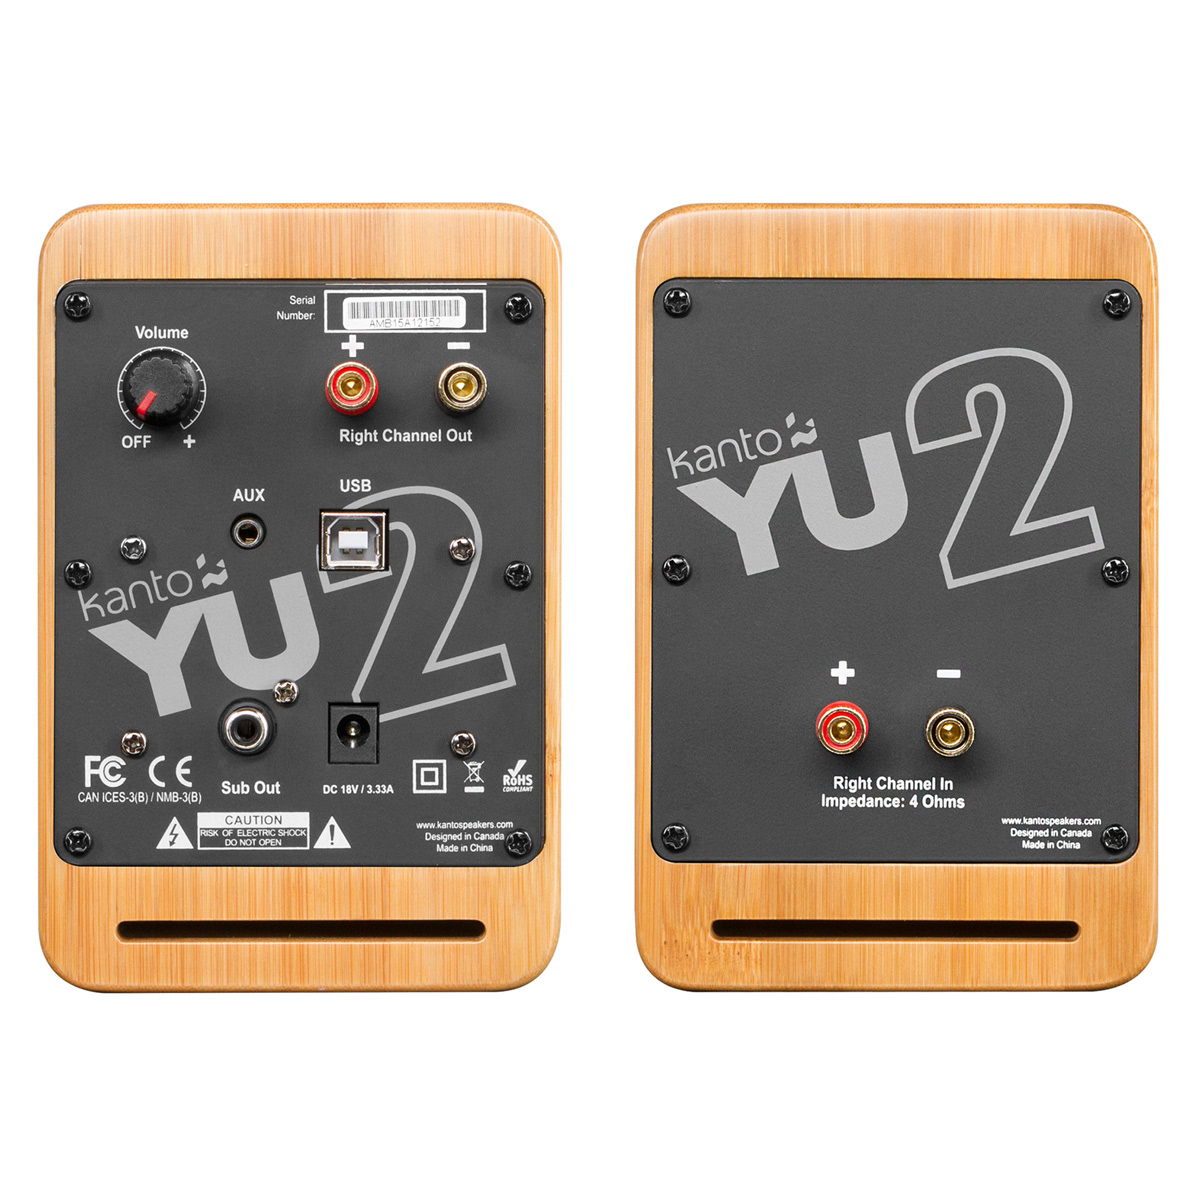 thumbnail 7 - Kanto YU2 Powered Desktop Speakers - Pair